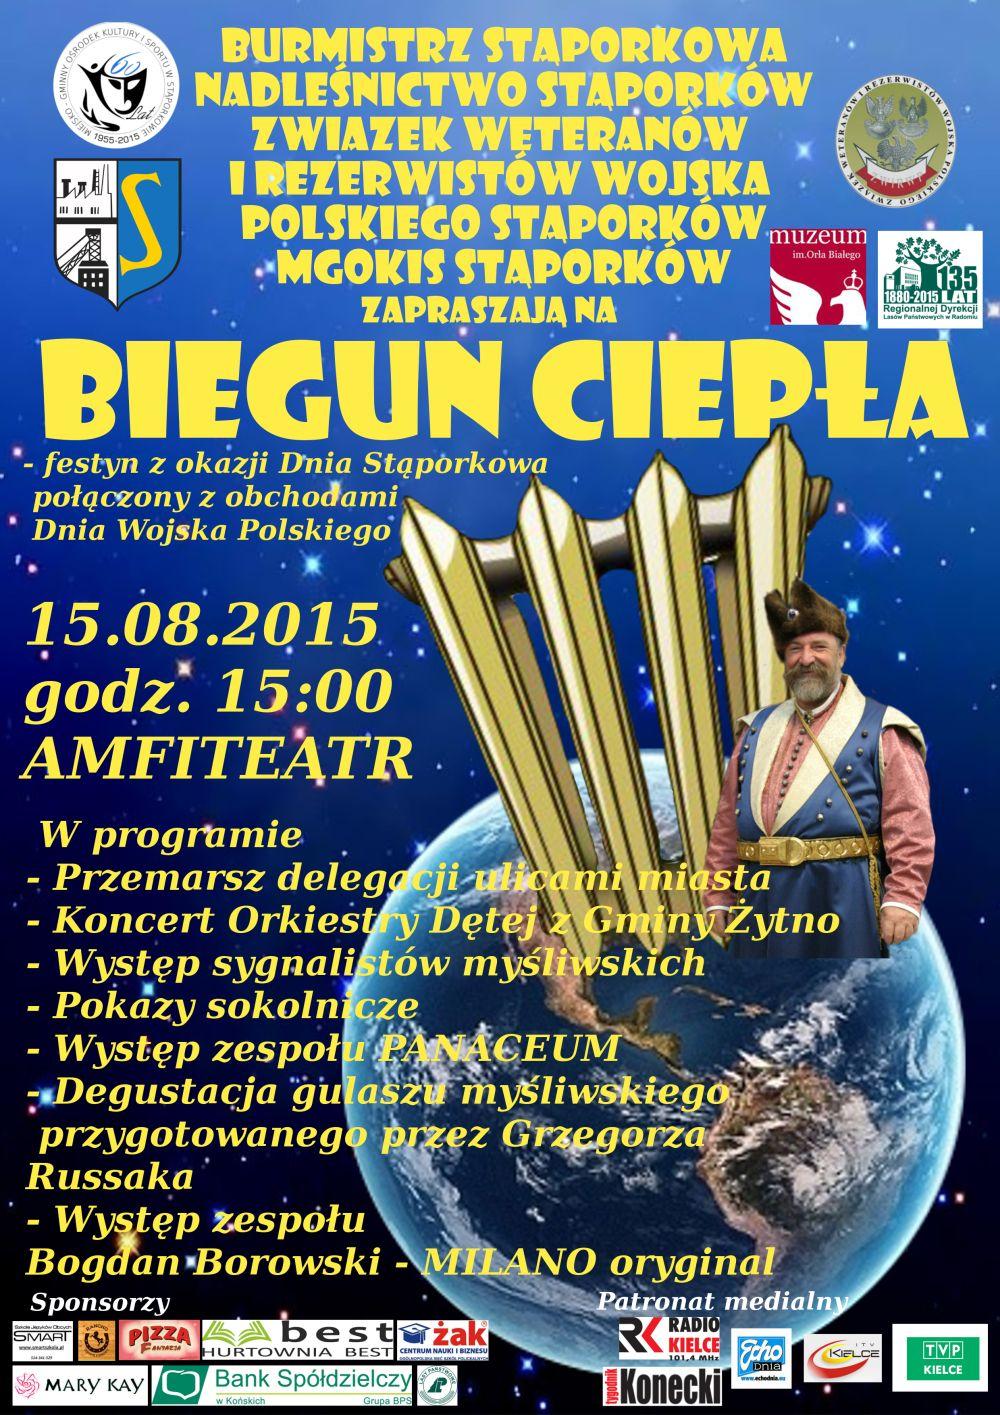 Biegun Ciepła 2015 plakat